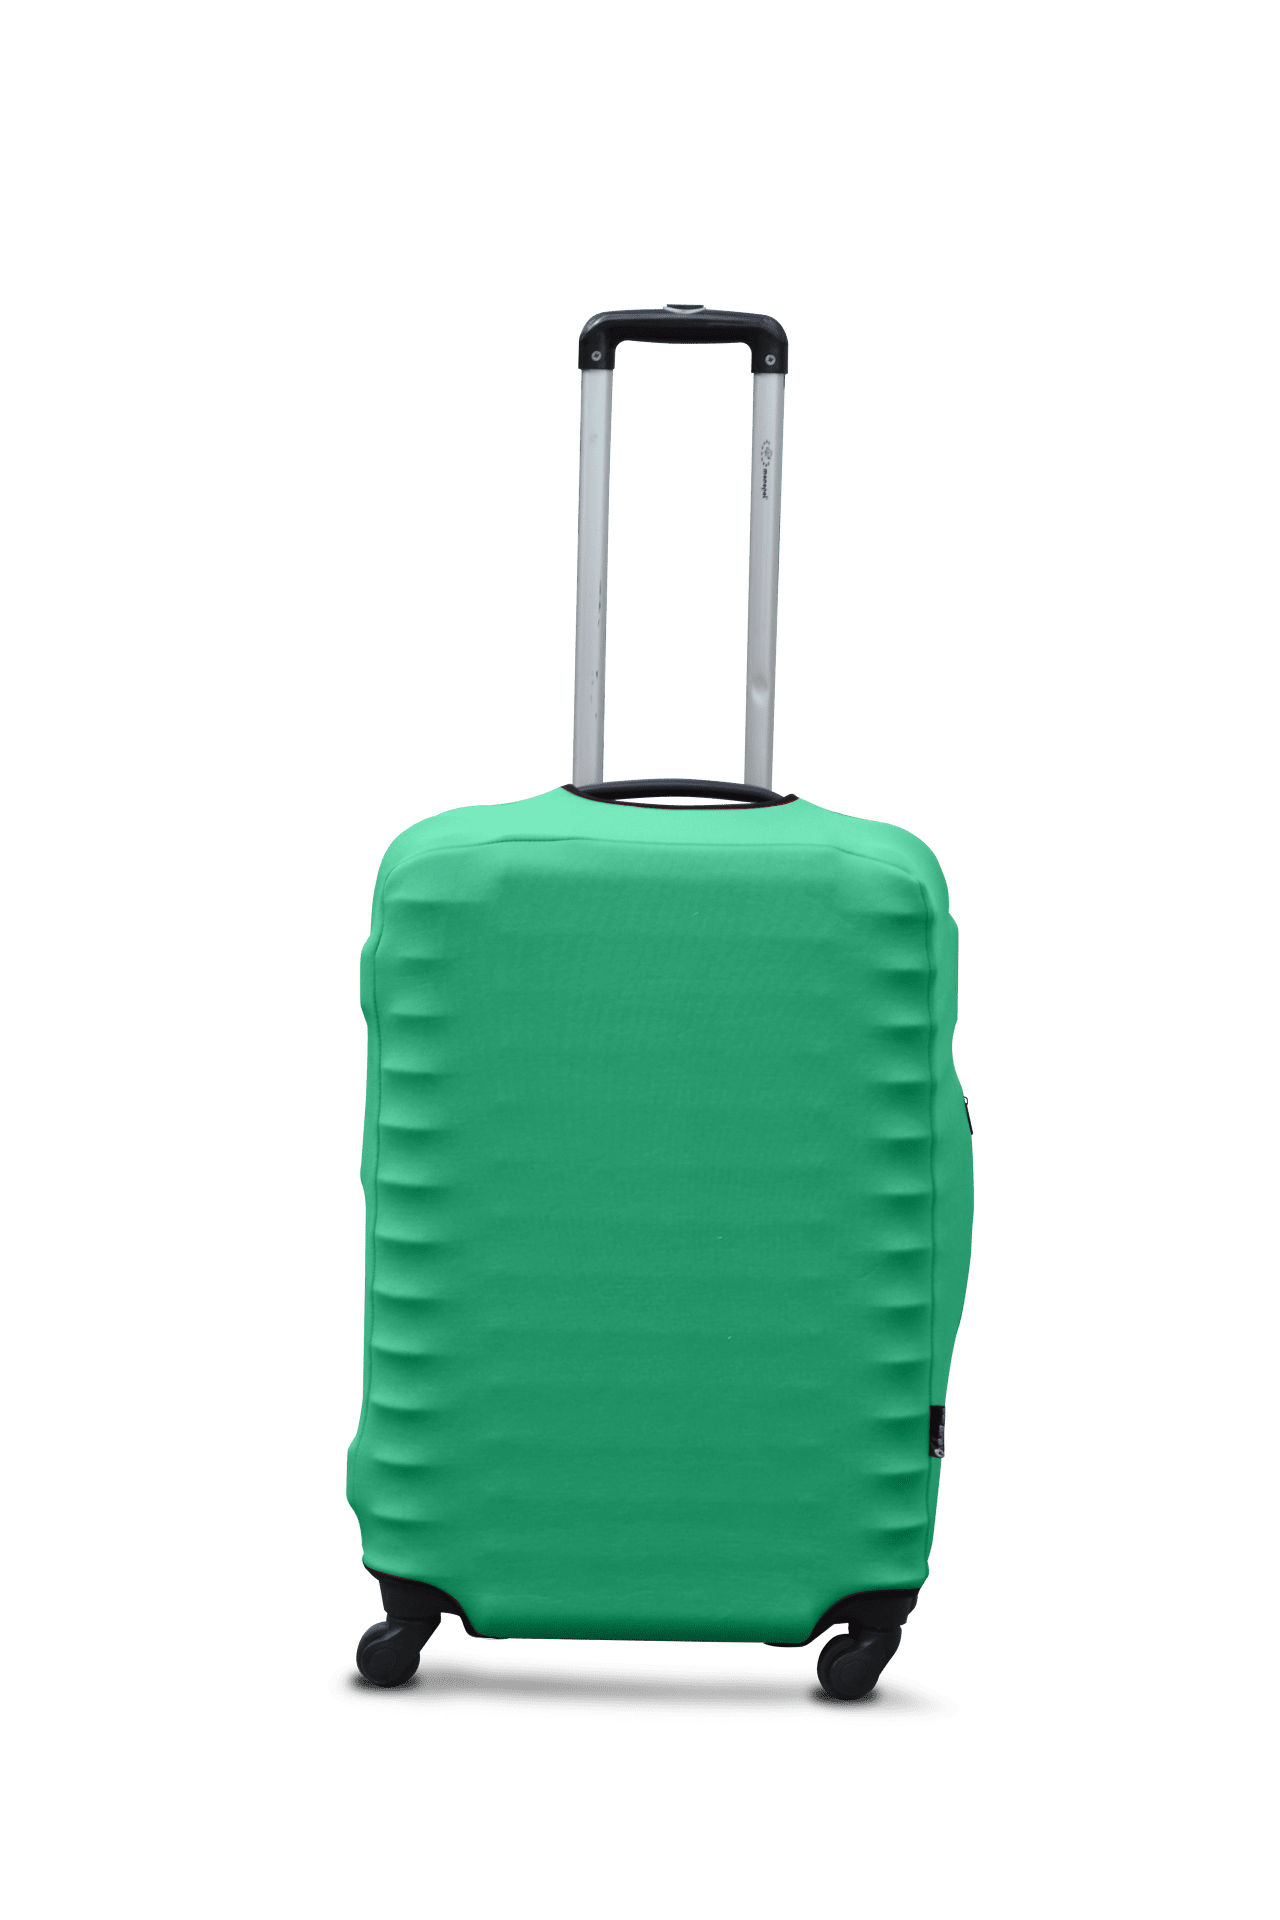 Husa pentru valiza daiving Cover DAWING S L.GREEN